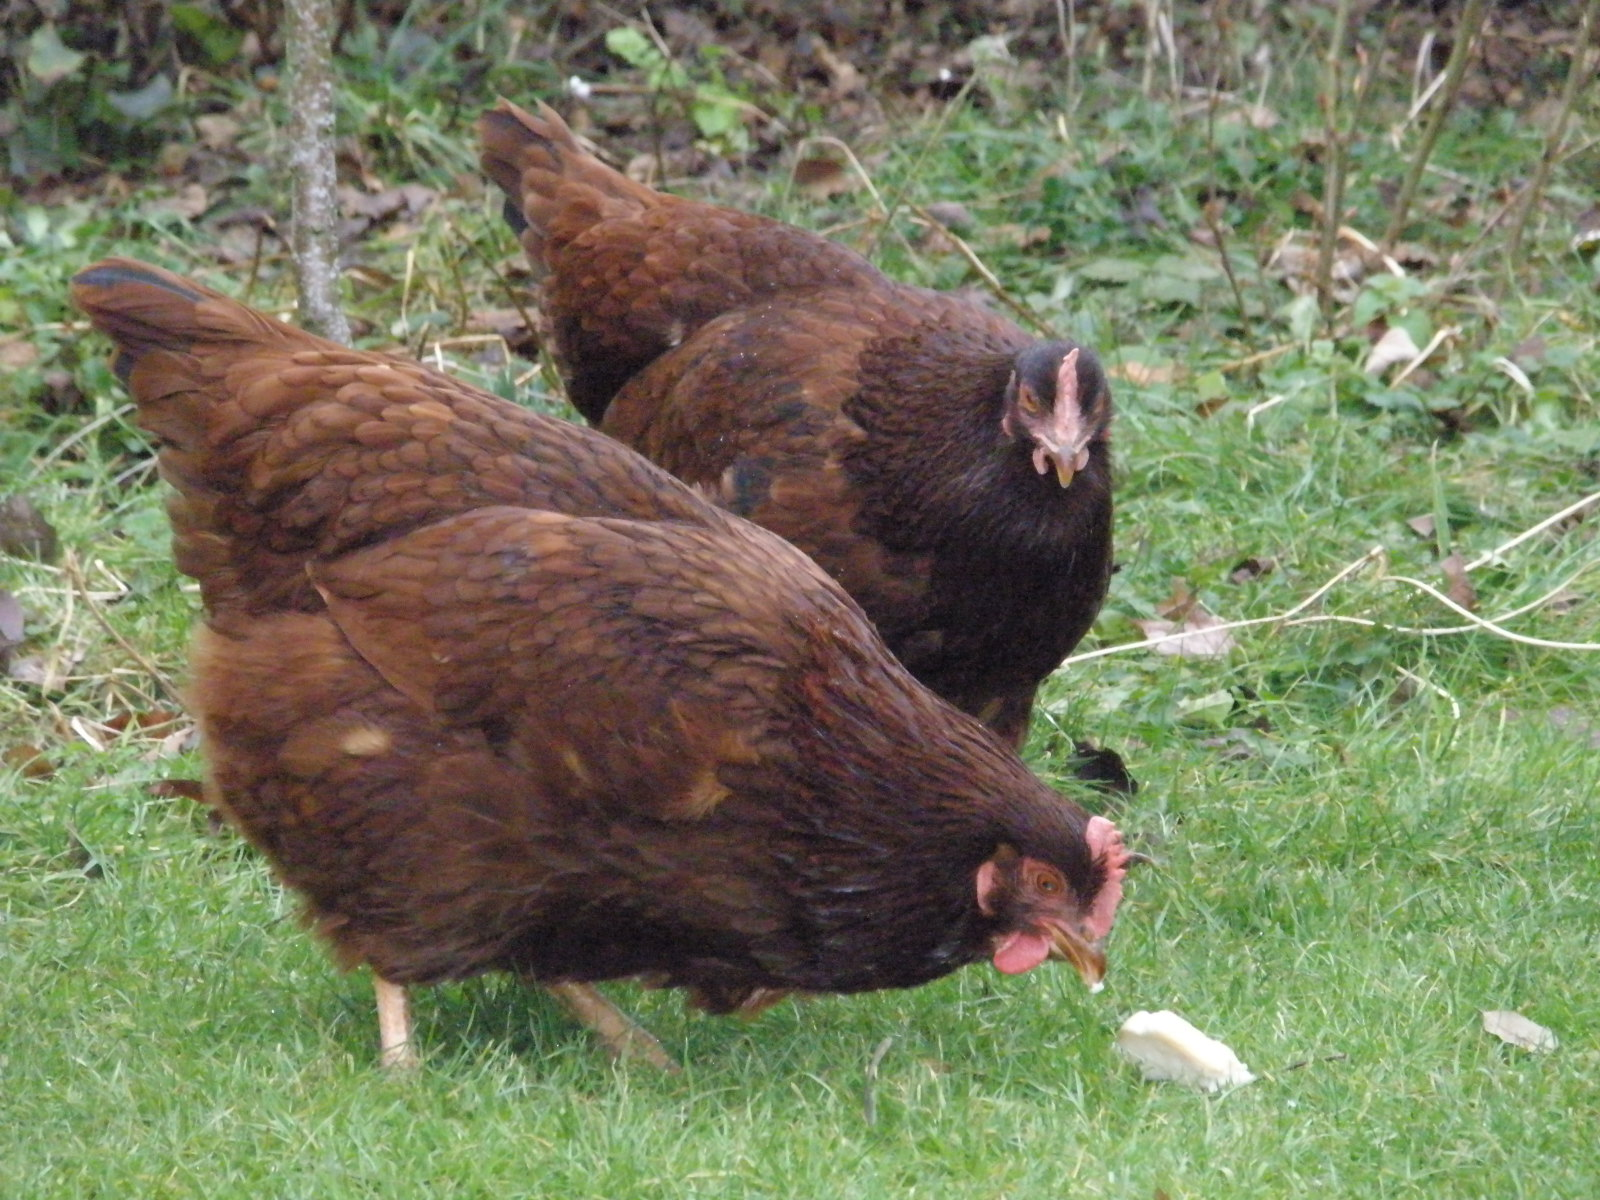 Rhode Island Red Hens. Credit: Sammmydavisdog Permission: CC BY 2.0